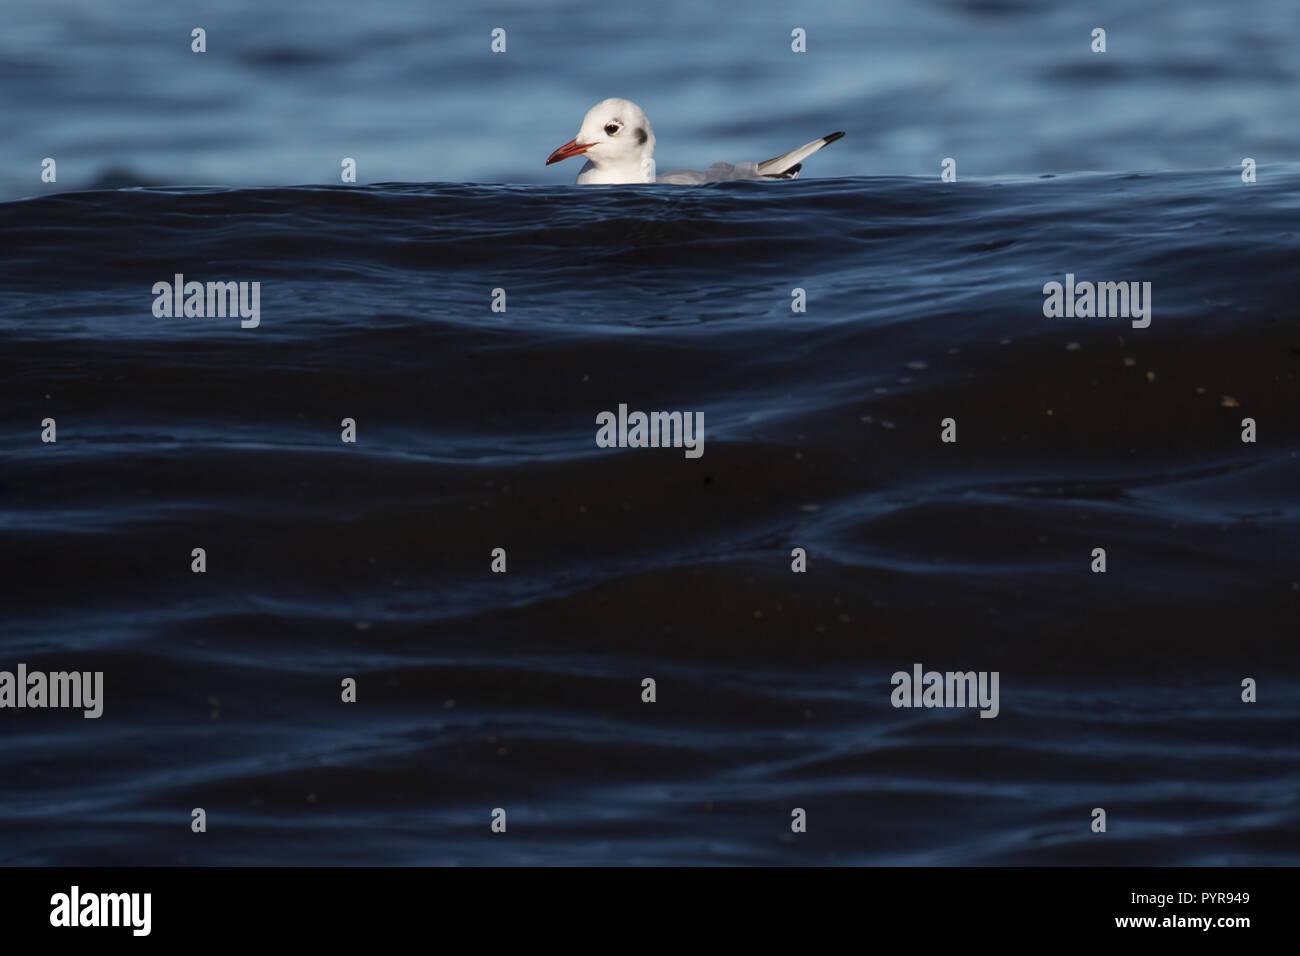 Black-headed gull dodging waves - Stock Image